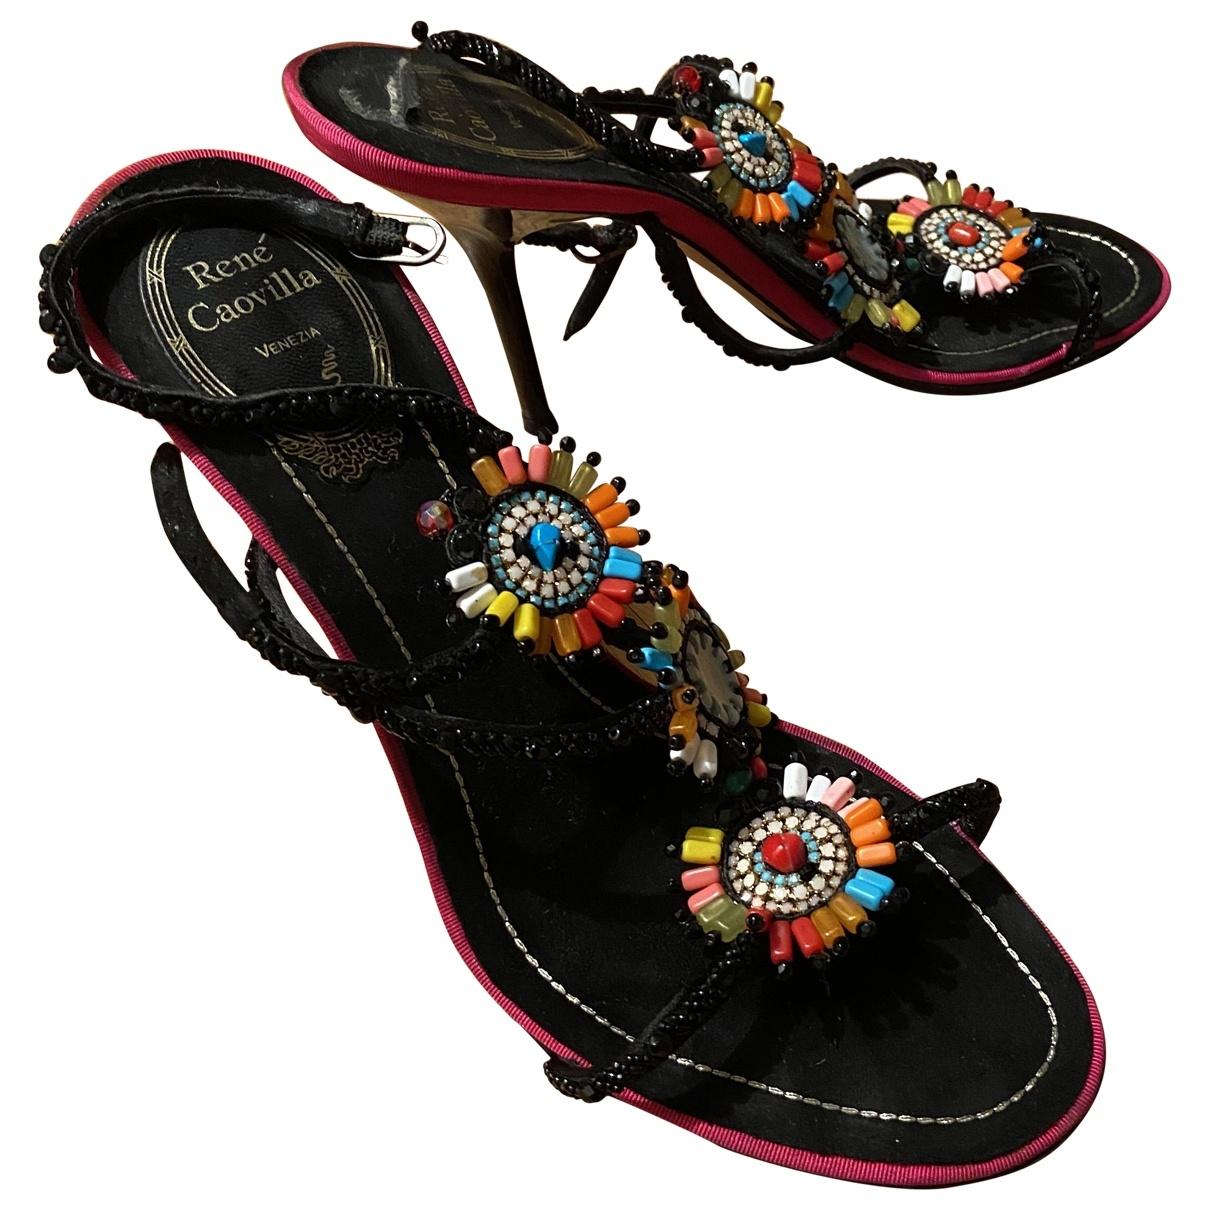 Sandalias de Lona Rene Caovilla